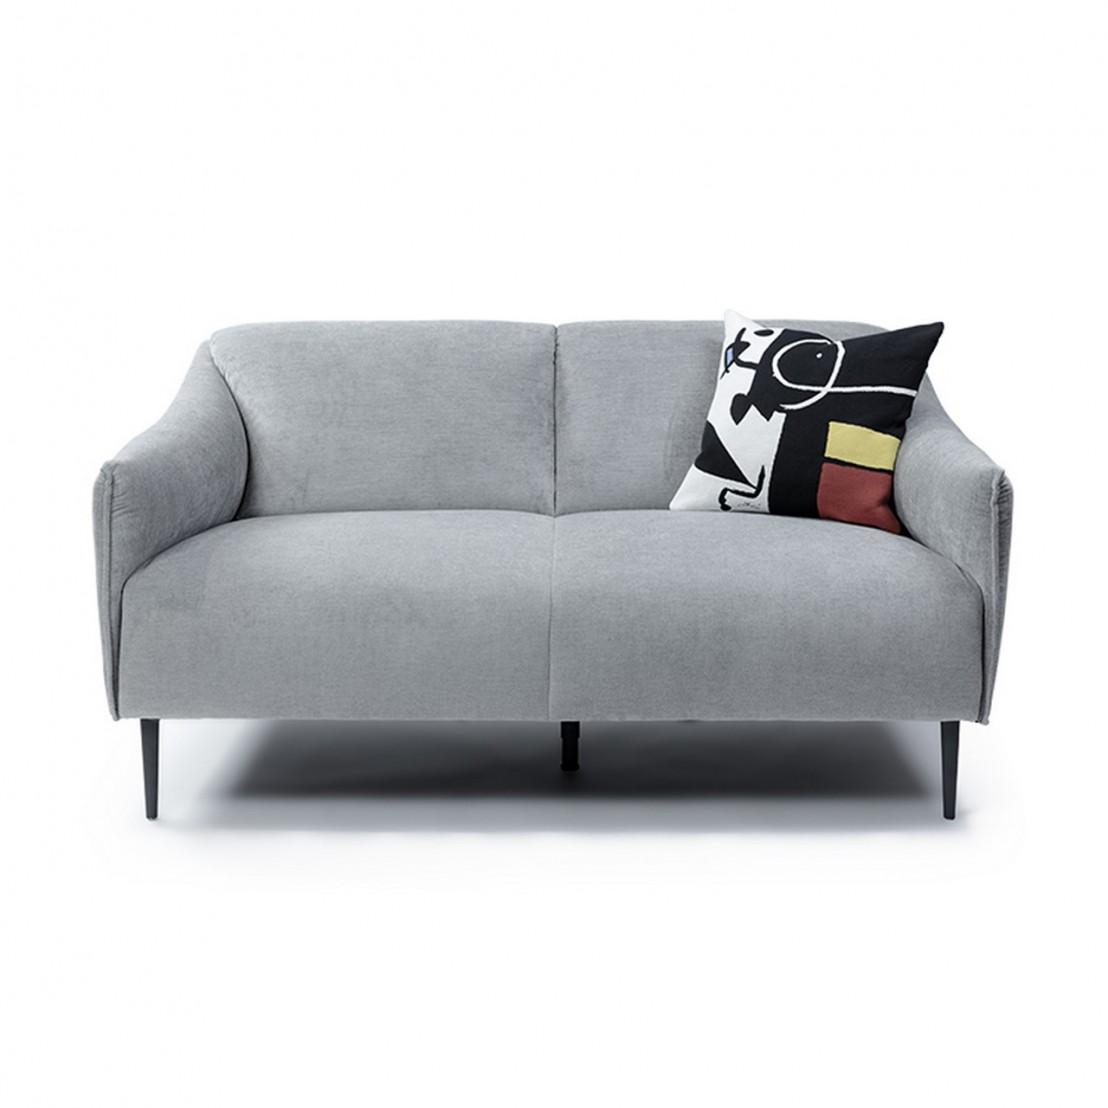 tr s petit canap 2 places accoudoirs troits dixie miss. Black Bedroom Furniture Sets. Home Design Ideas